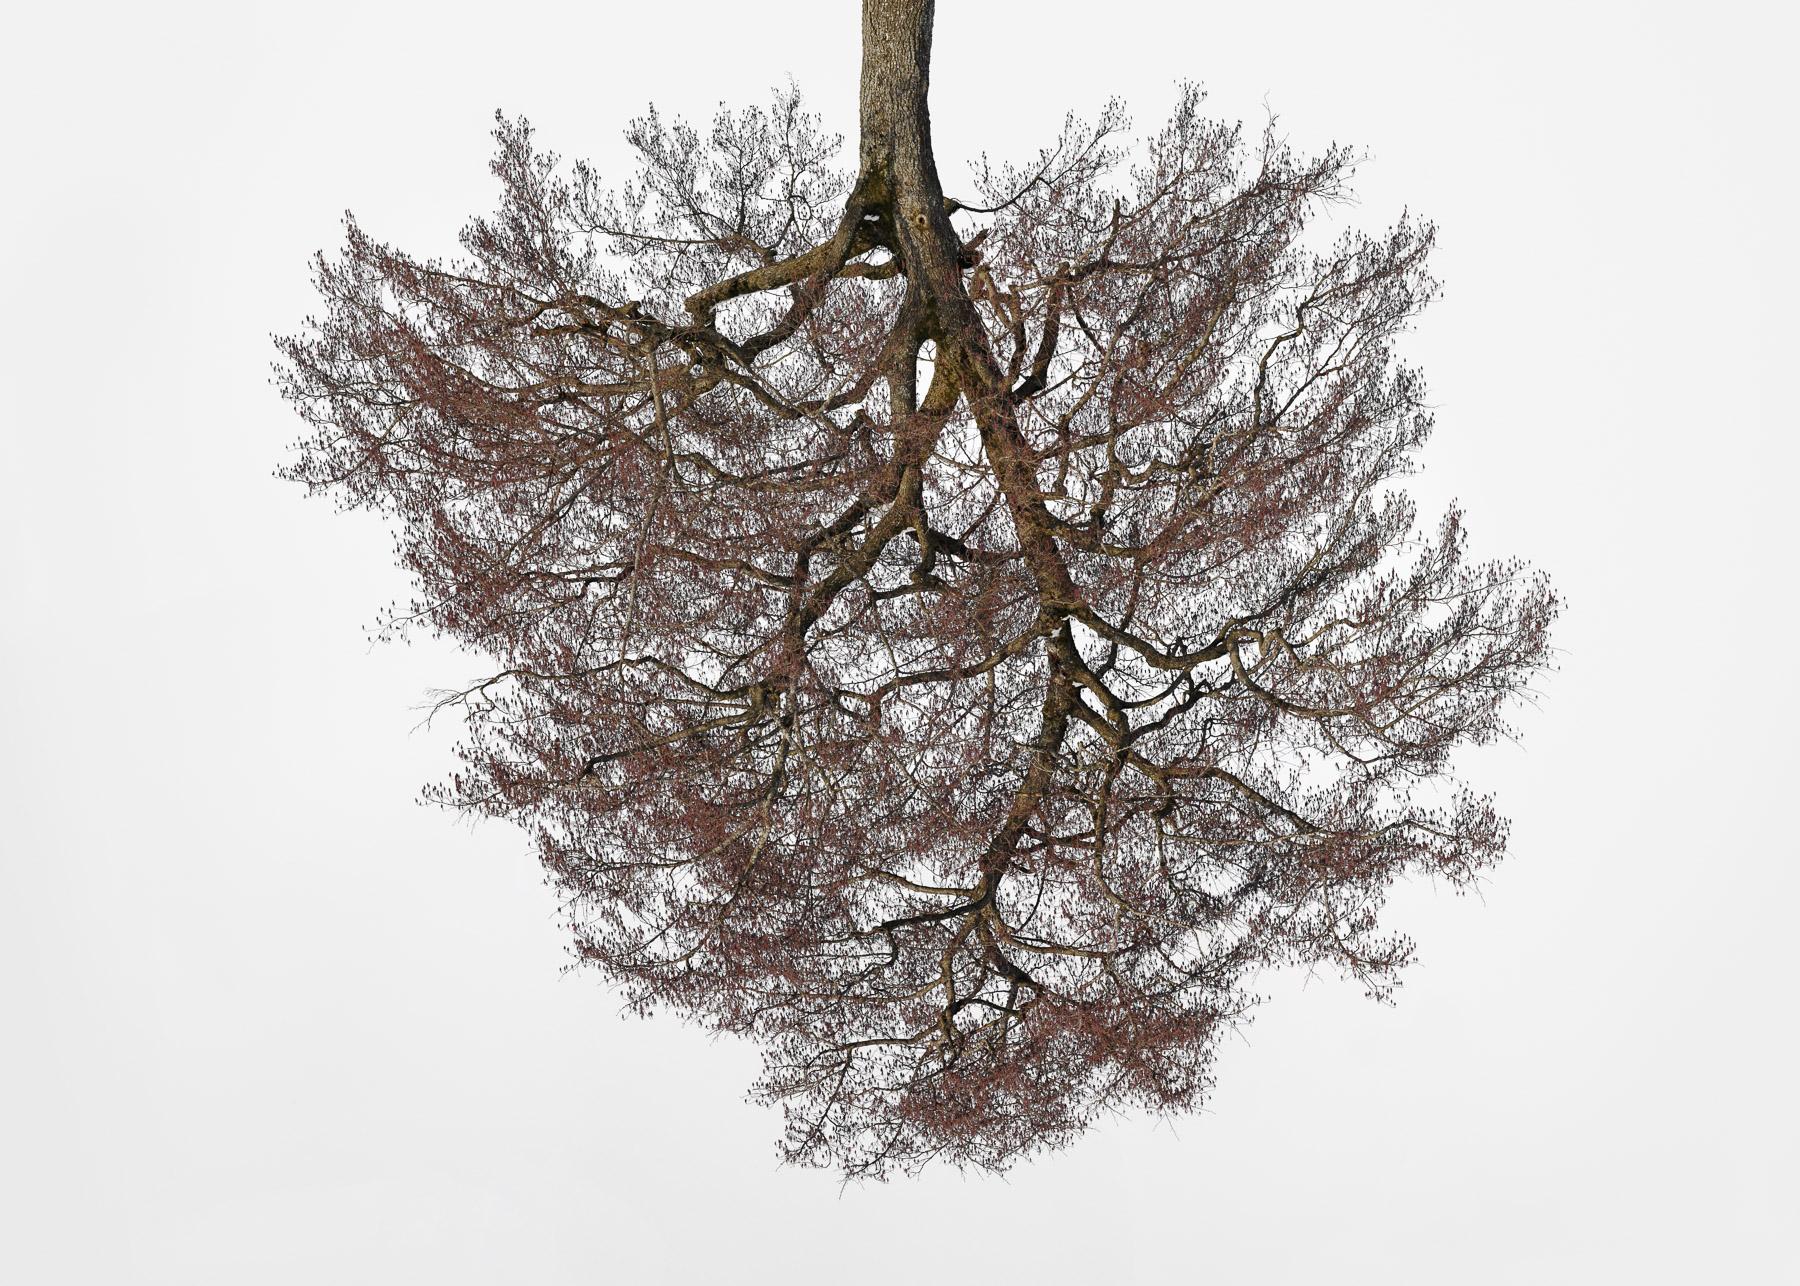 Christoph_Franke_Tree-Crowns_TC-02_01.jpg